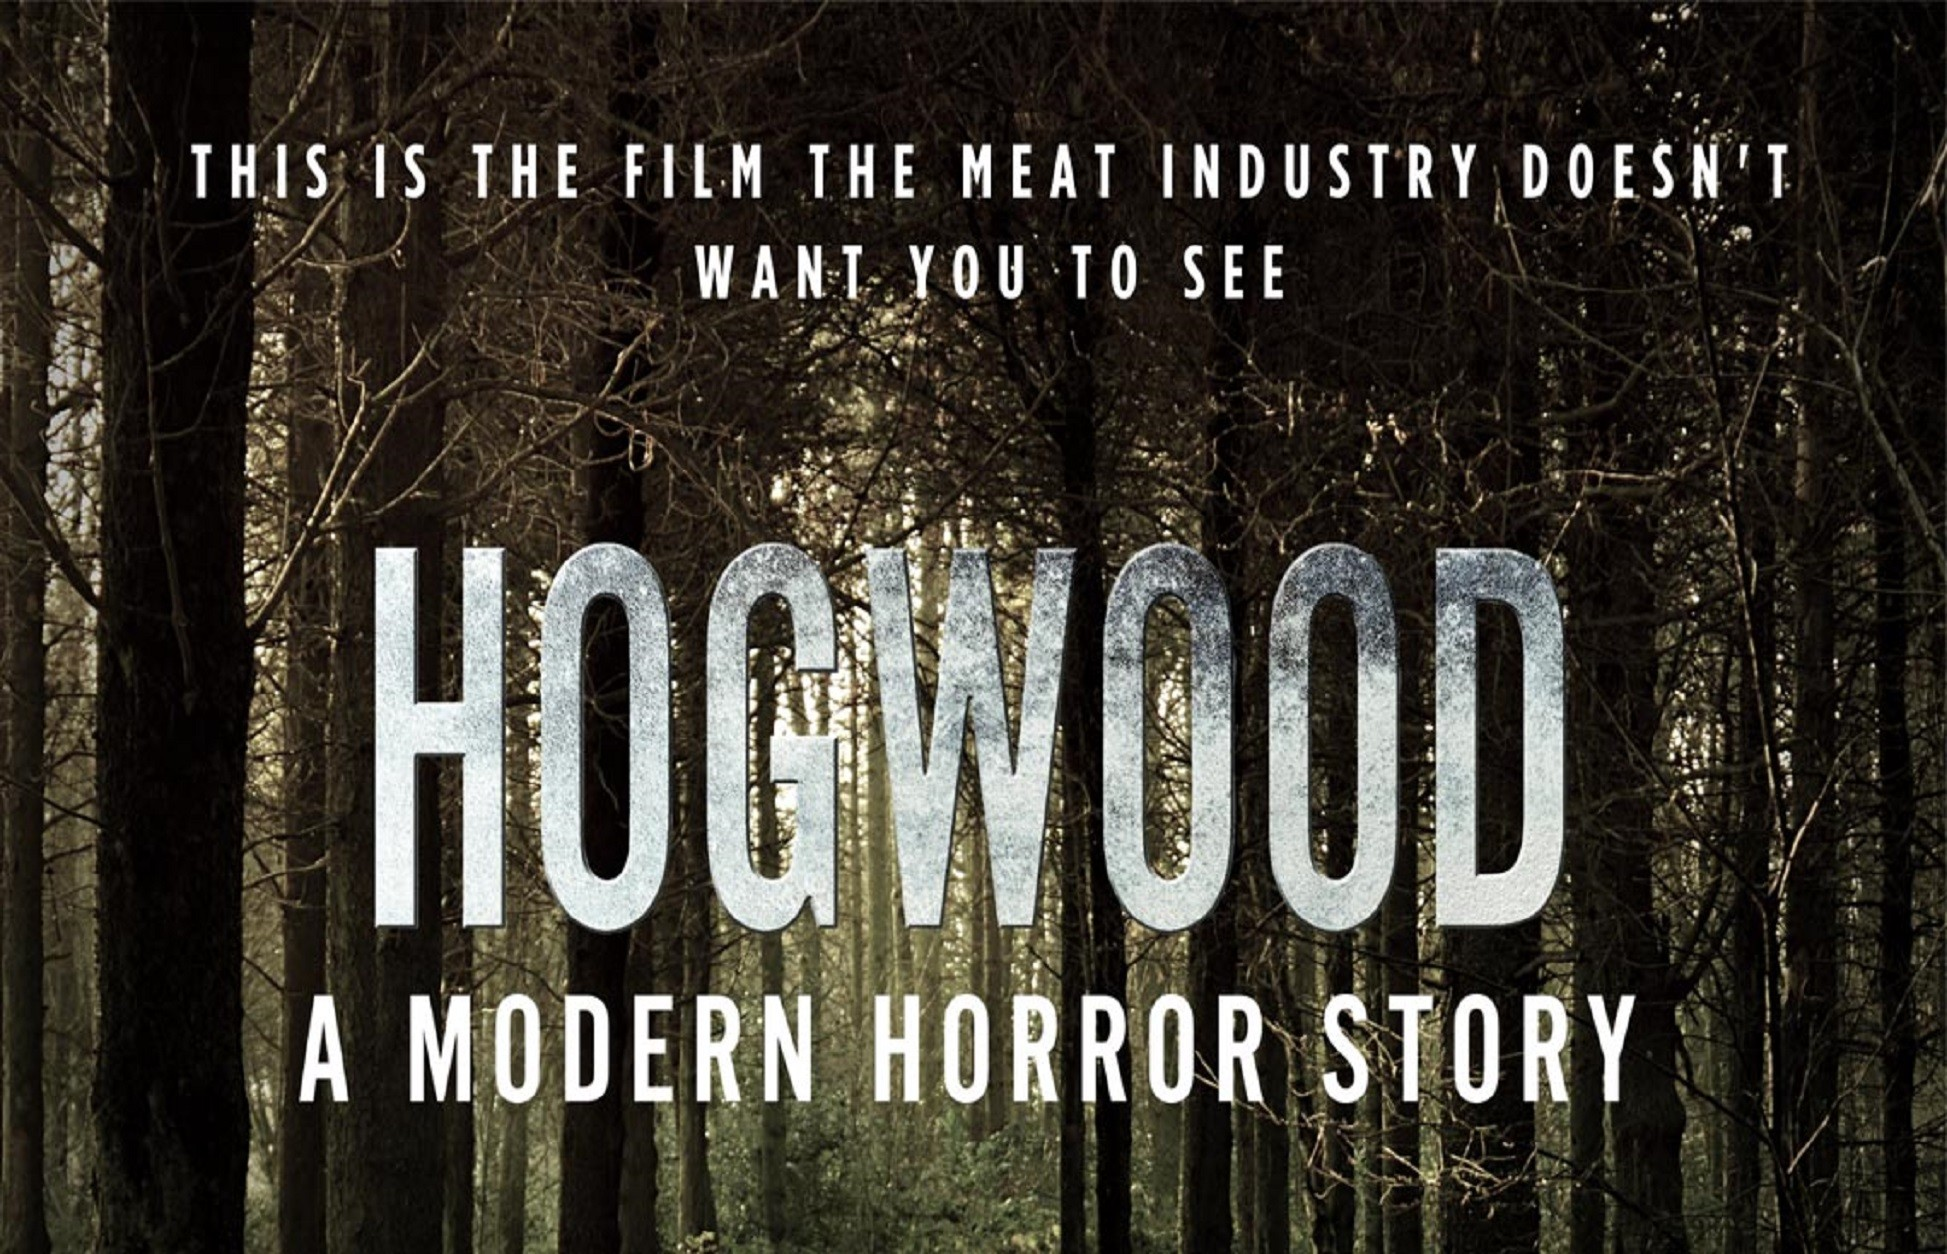 Hogwood: A Modern Horror Story